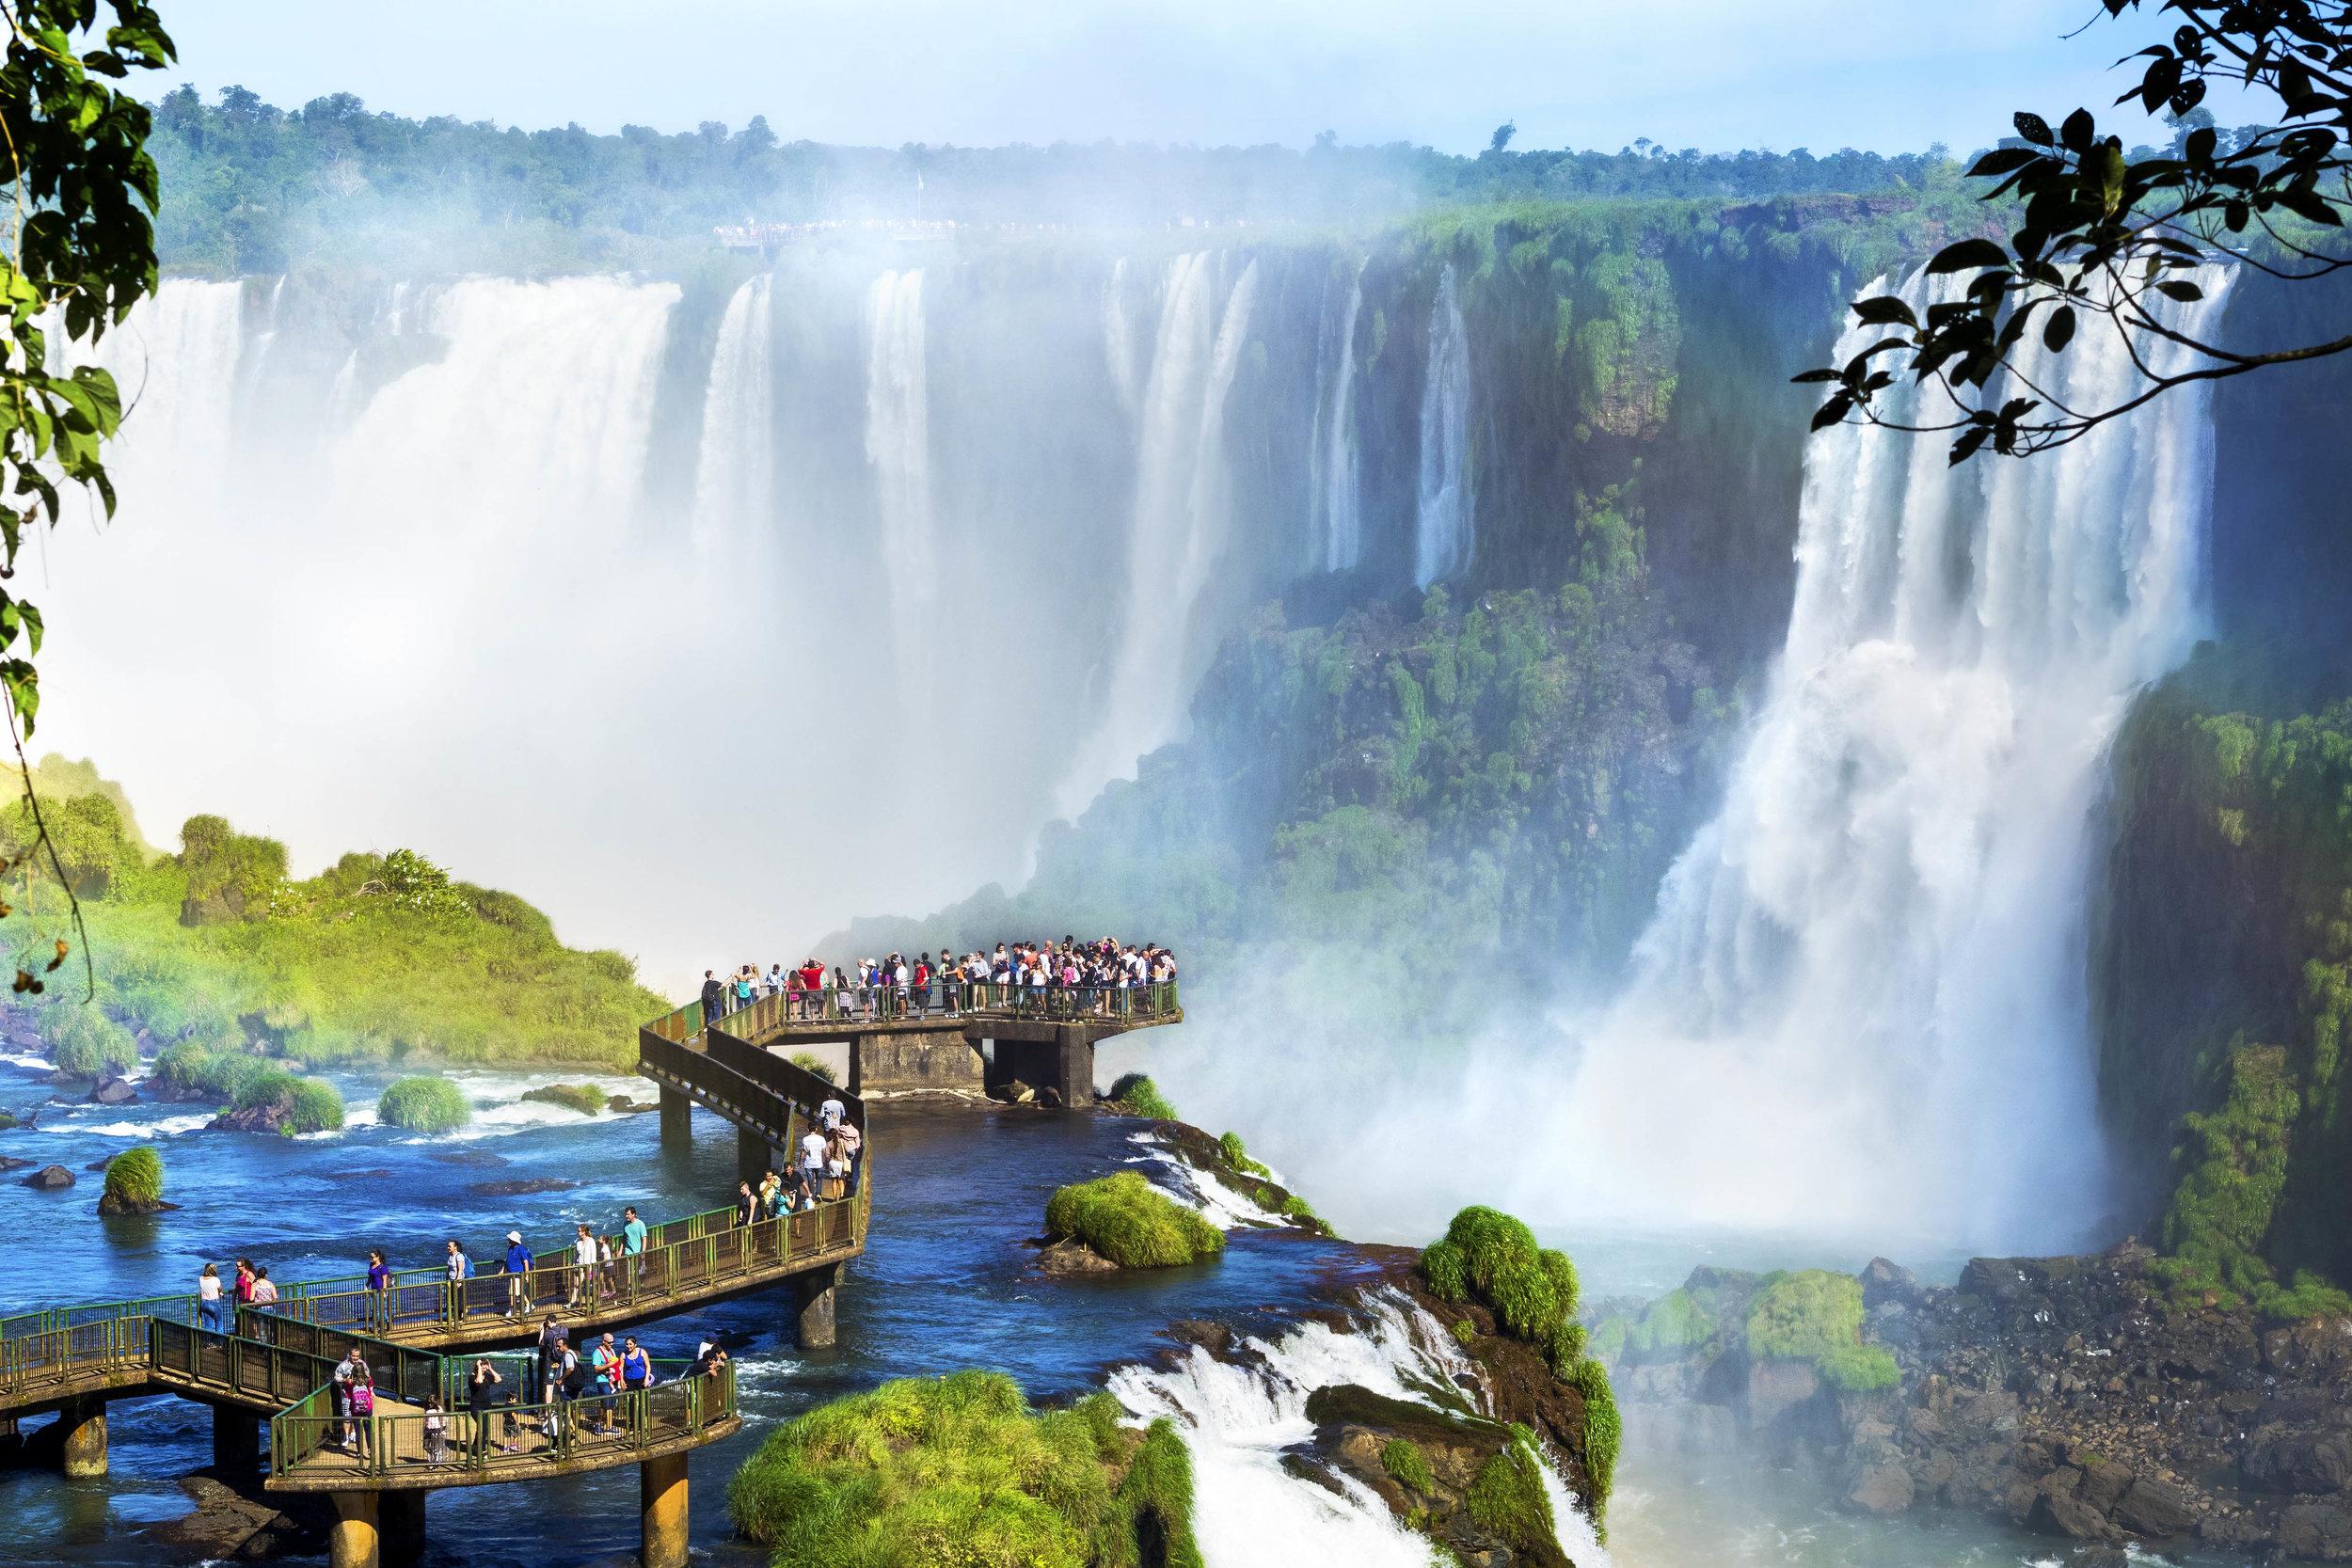 Iguassu Falls, Brazil & Argentina Border